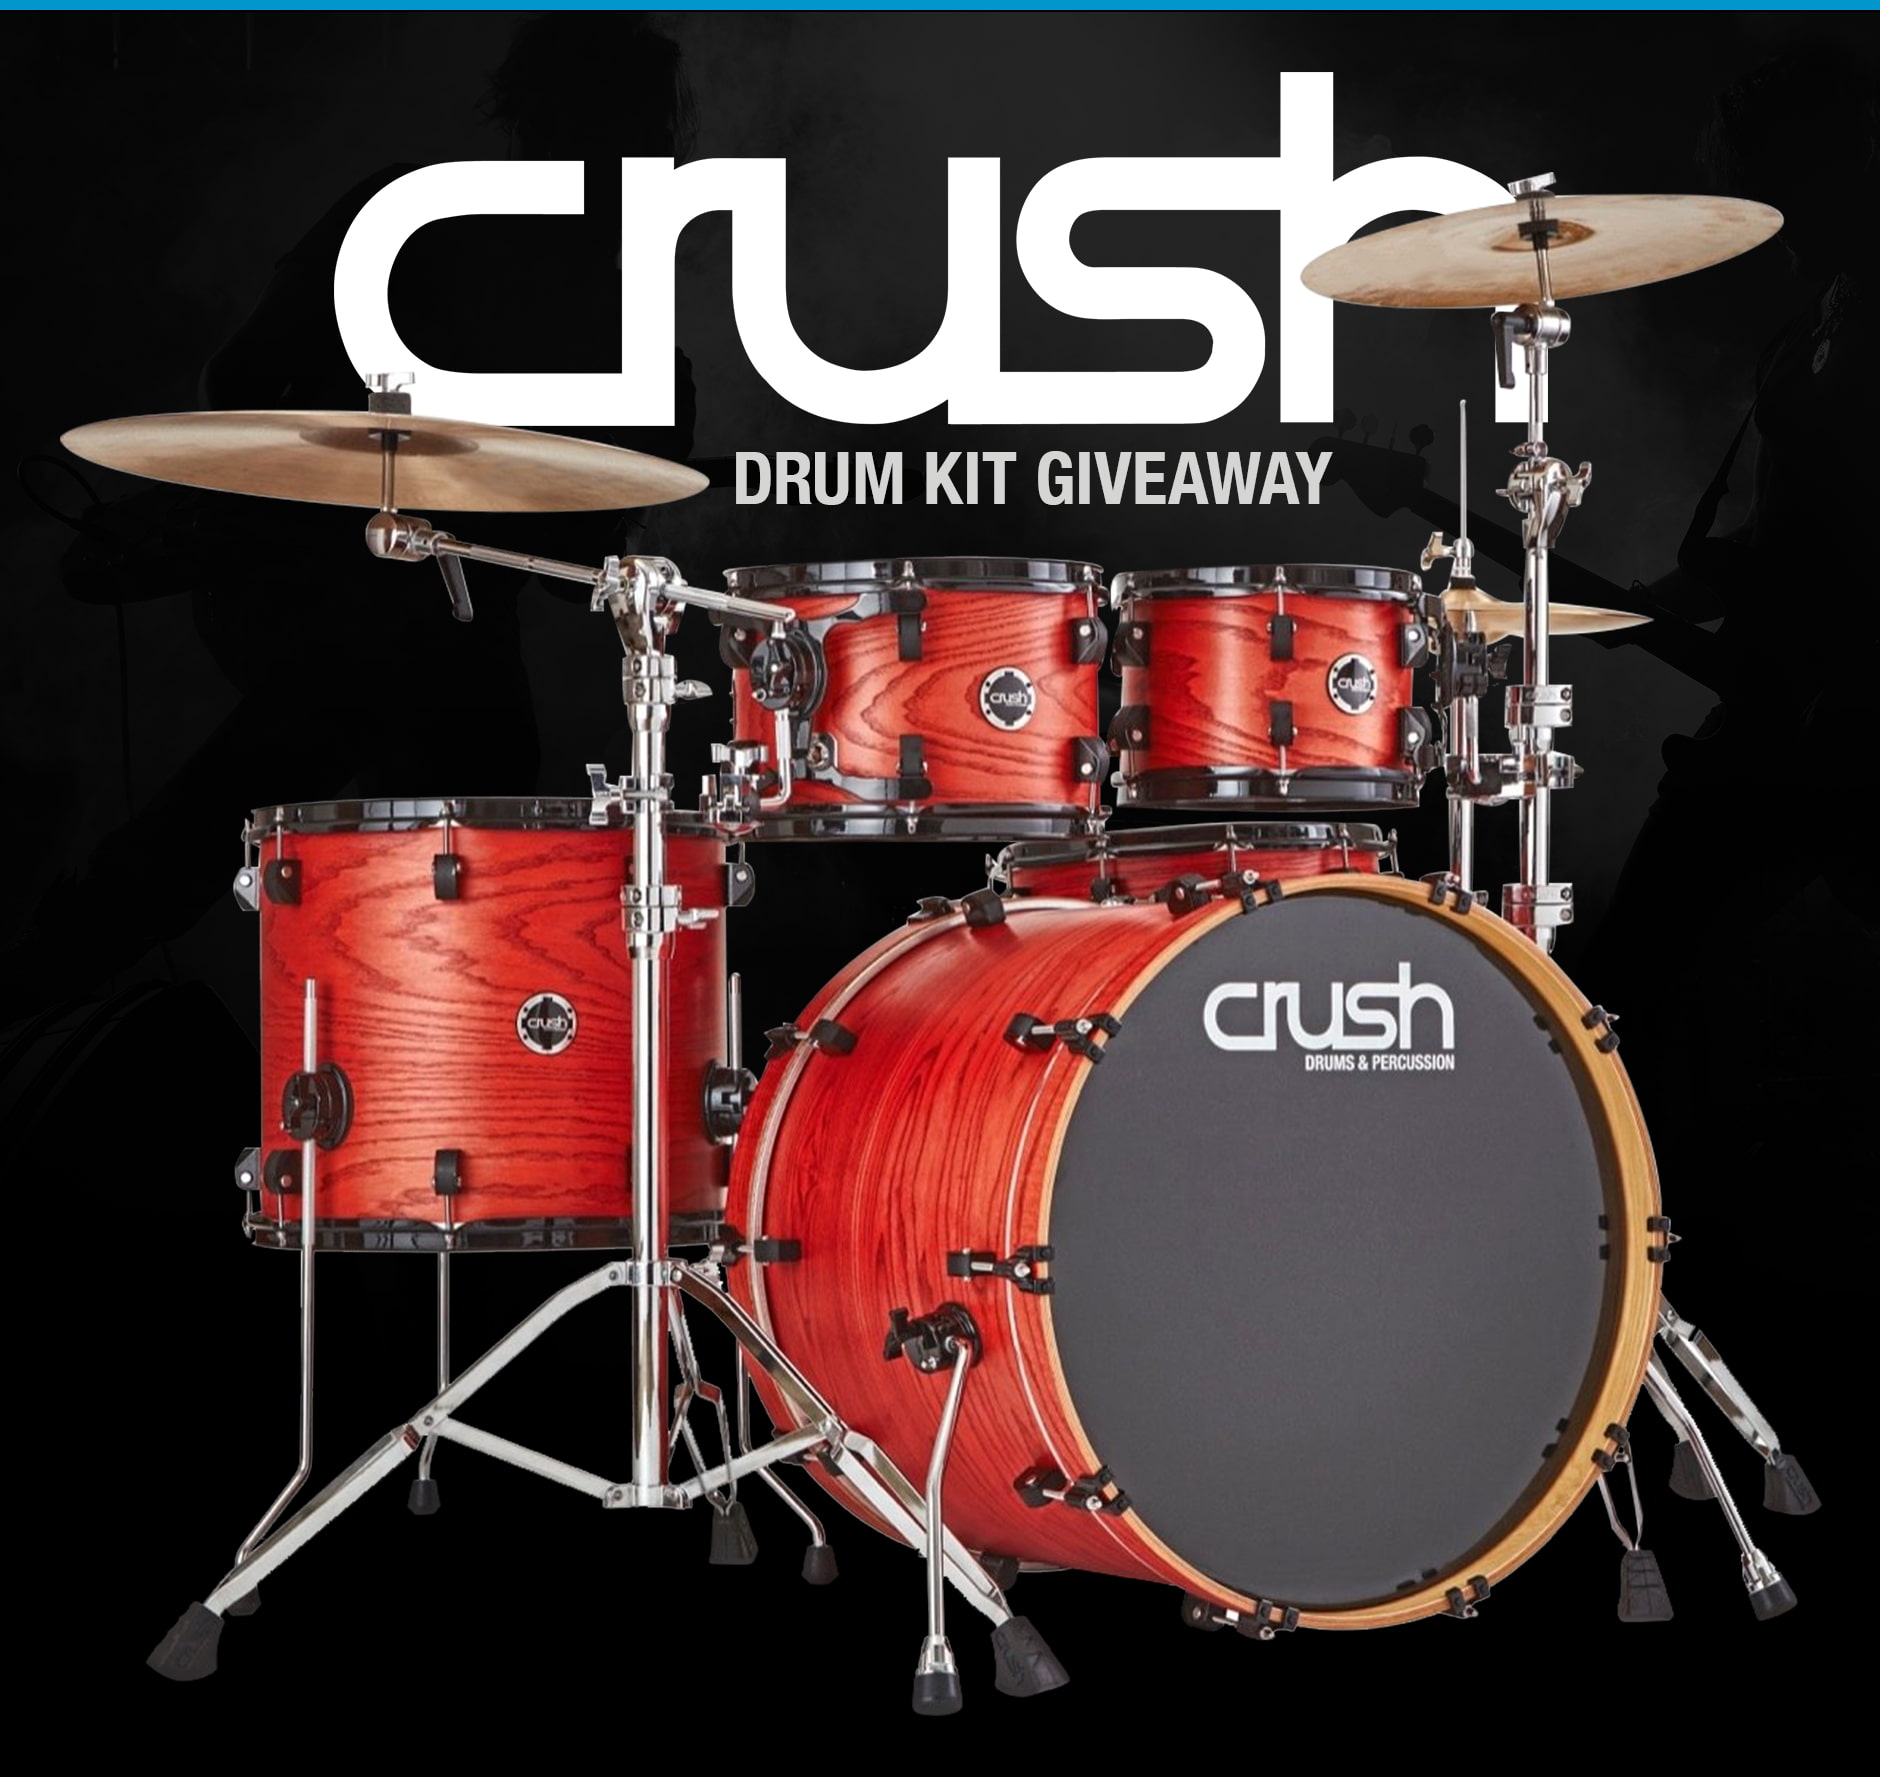 Crush Drum Kit Giveaway